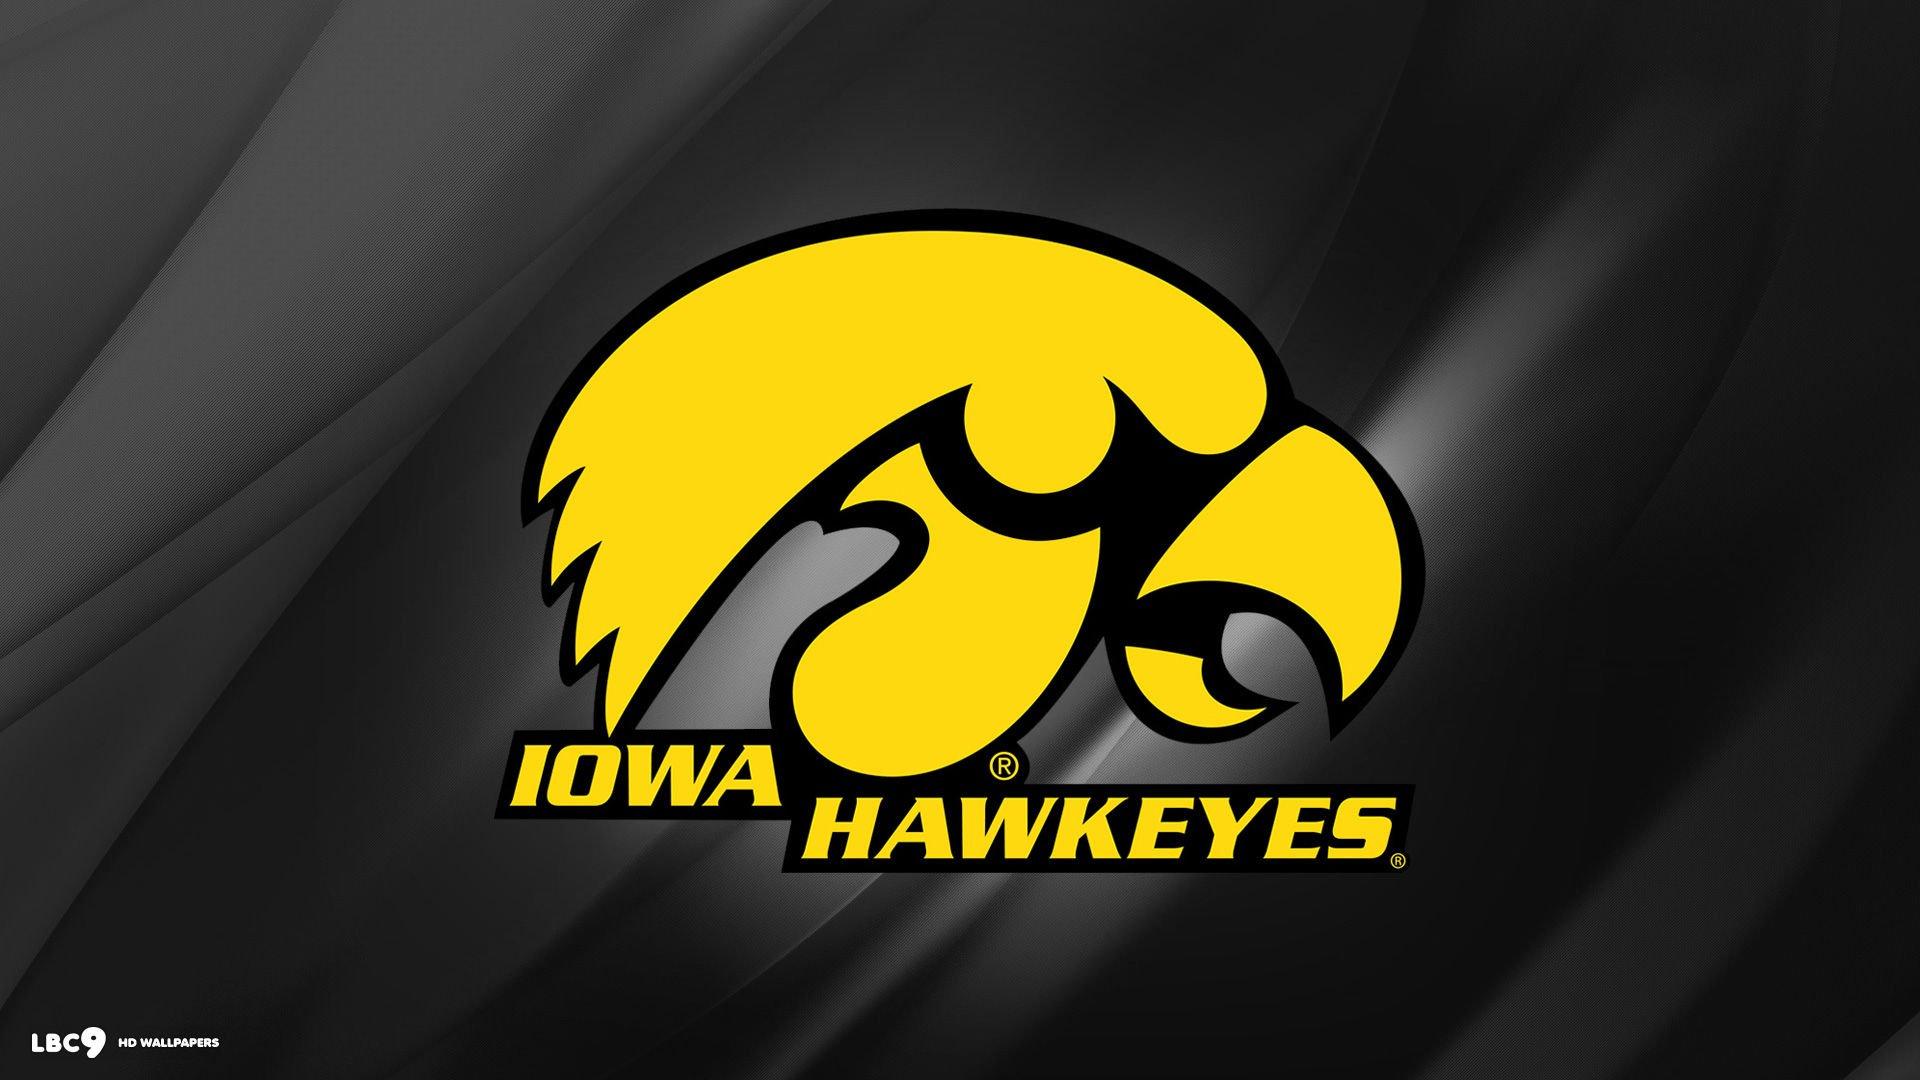 IOWA HAWKEYES college football wallpaper background 1920x1080